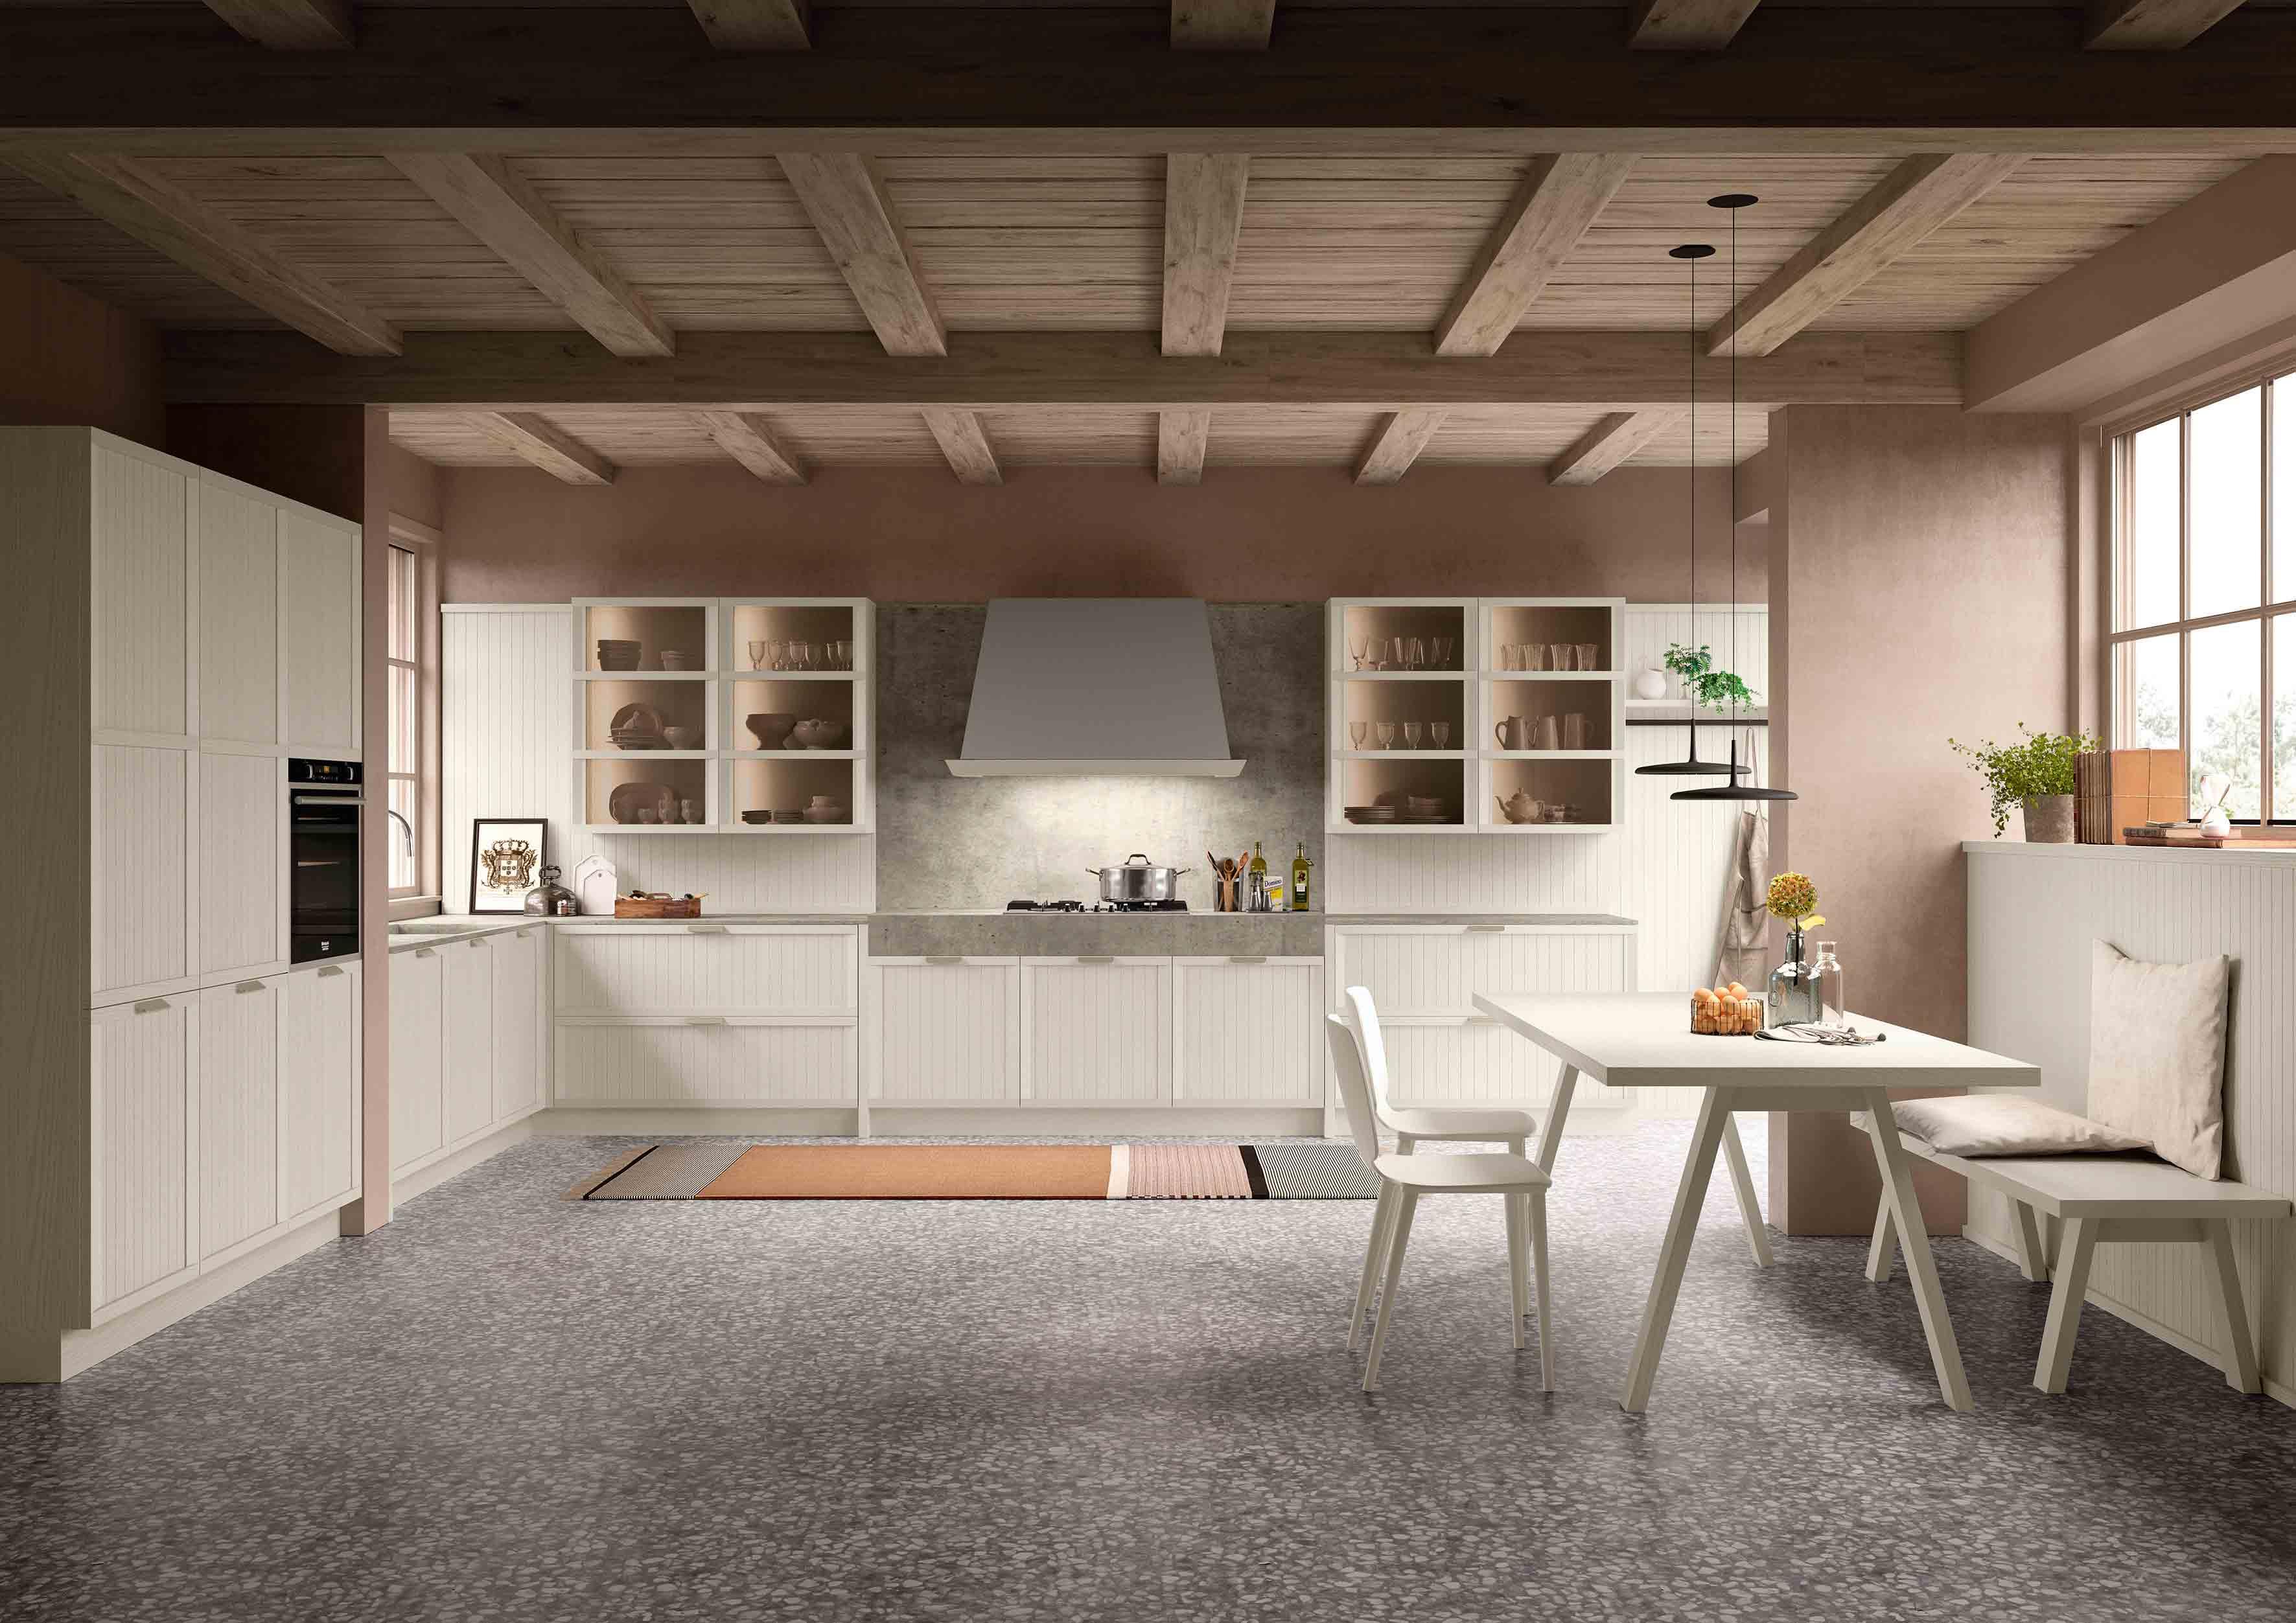 Stosa Tosca Traditional Kitchen Sydney - Eurolife